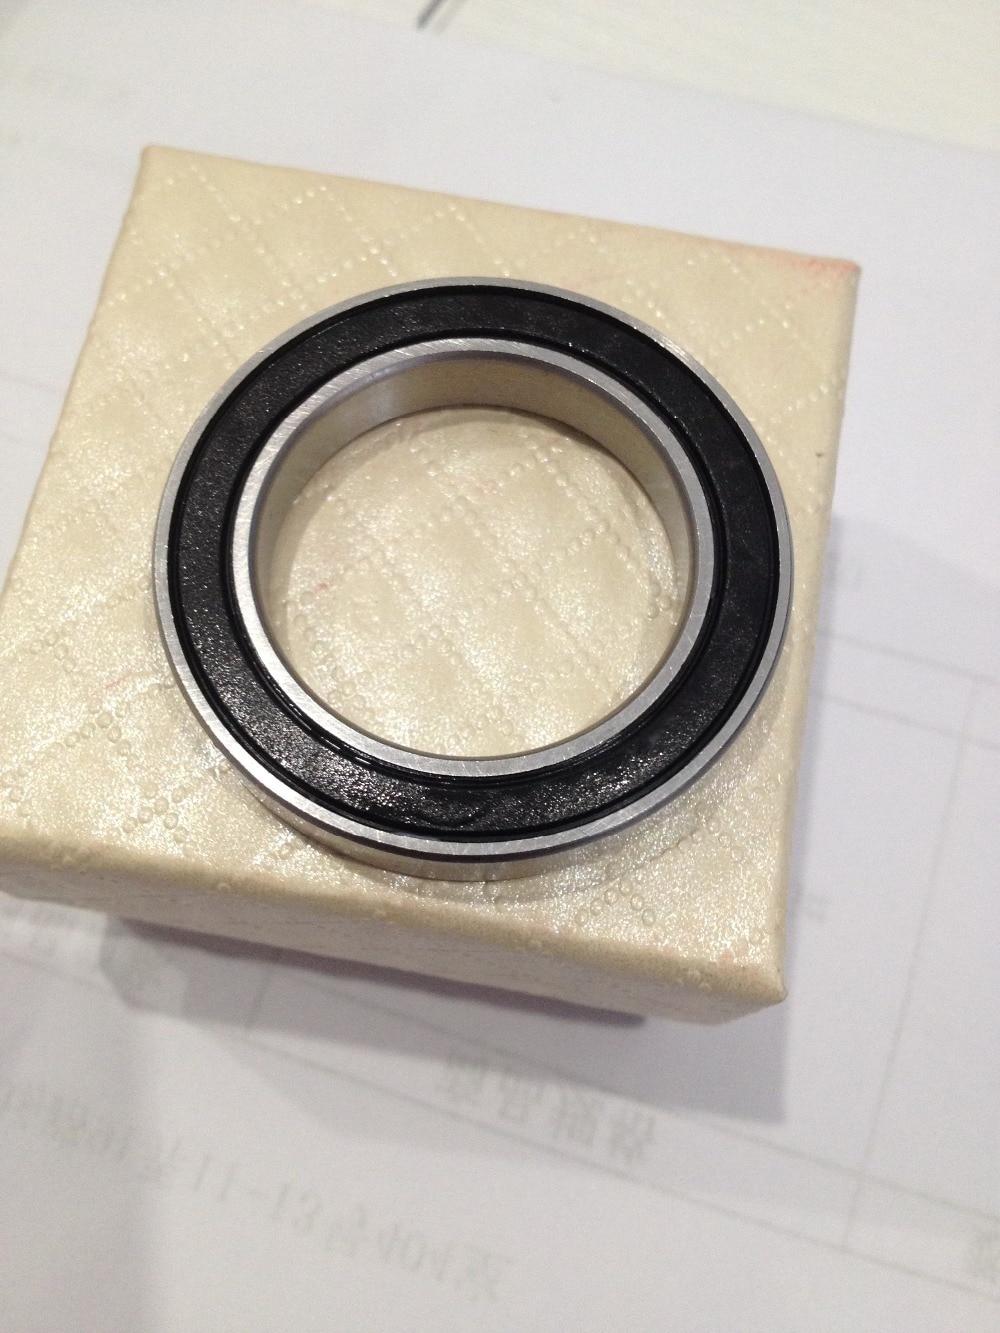 Hollowtech(HT2) bottom bracket bearing 6805N-2RS(25*37*6 mm, stainless ceramic) stainless ceramic bearing sc6901 2rs 12 24 6 mm for mavic novatec wheel hubs